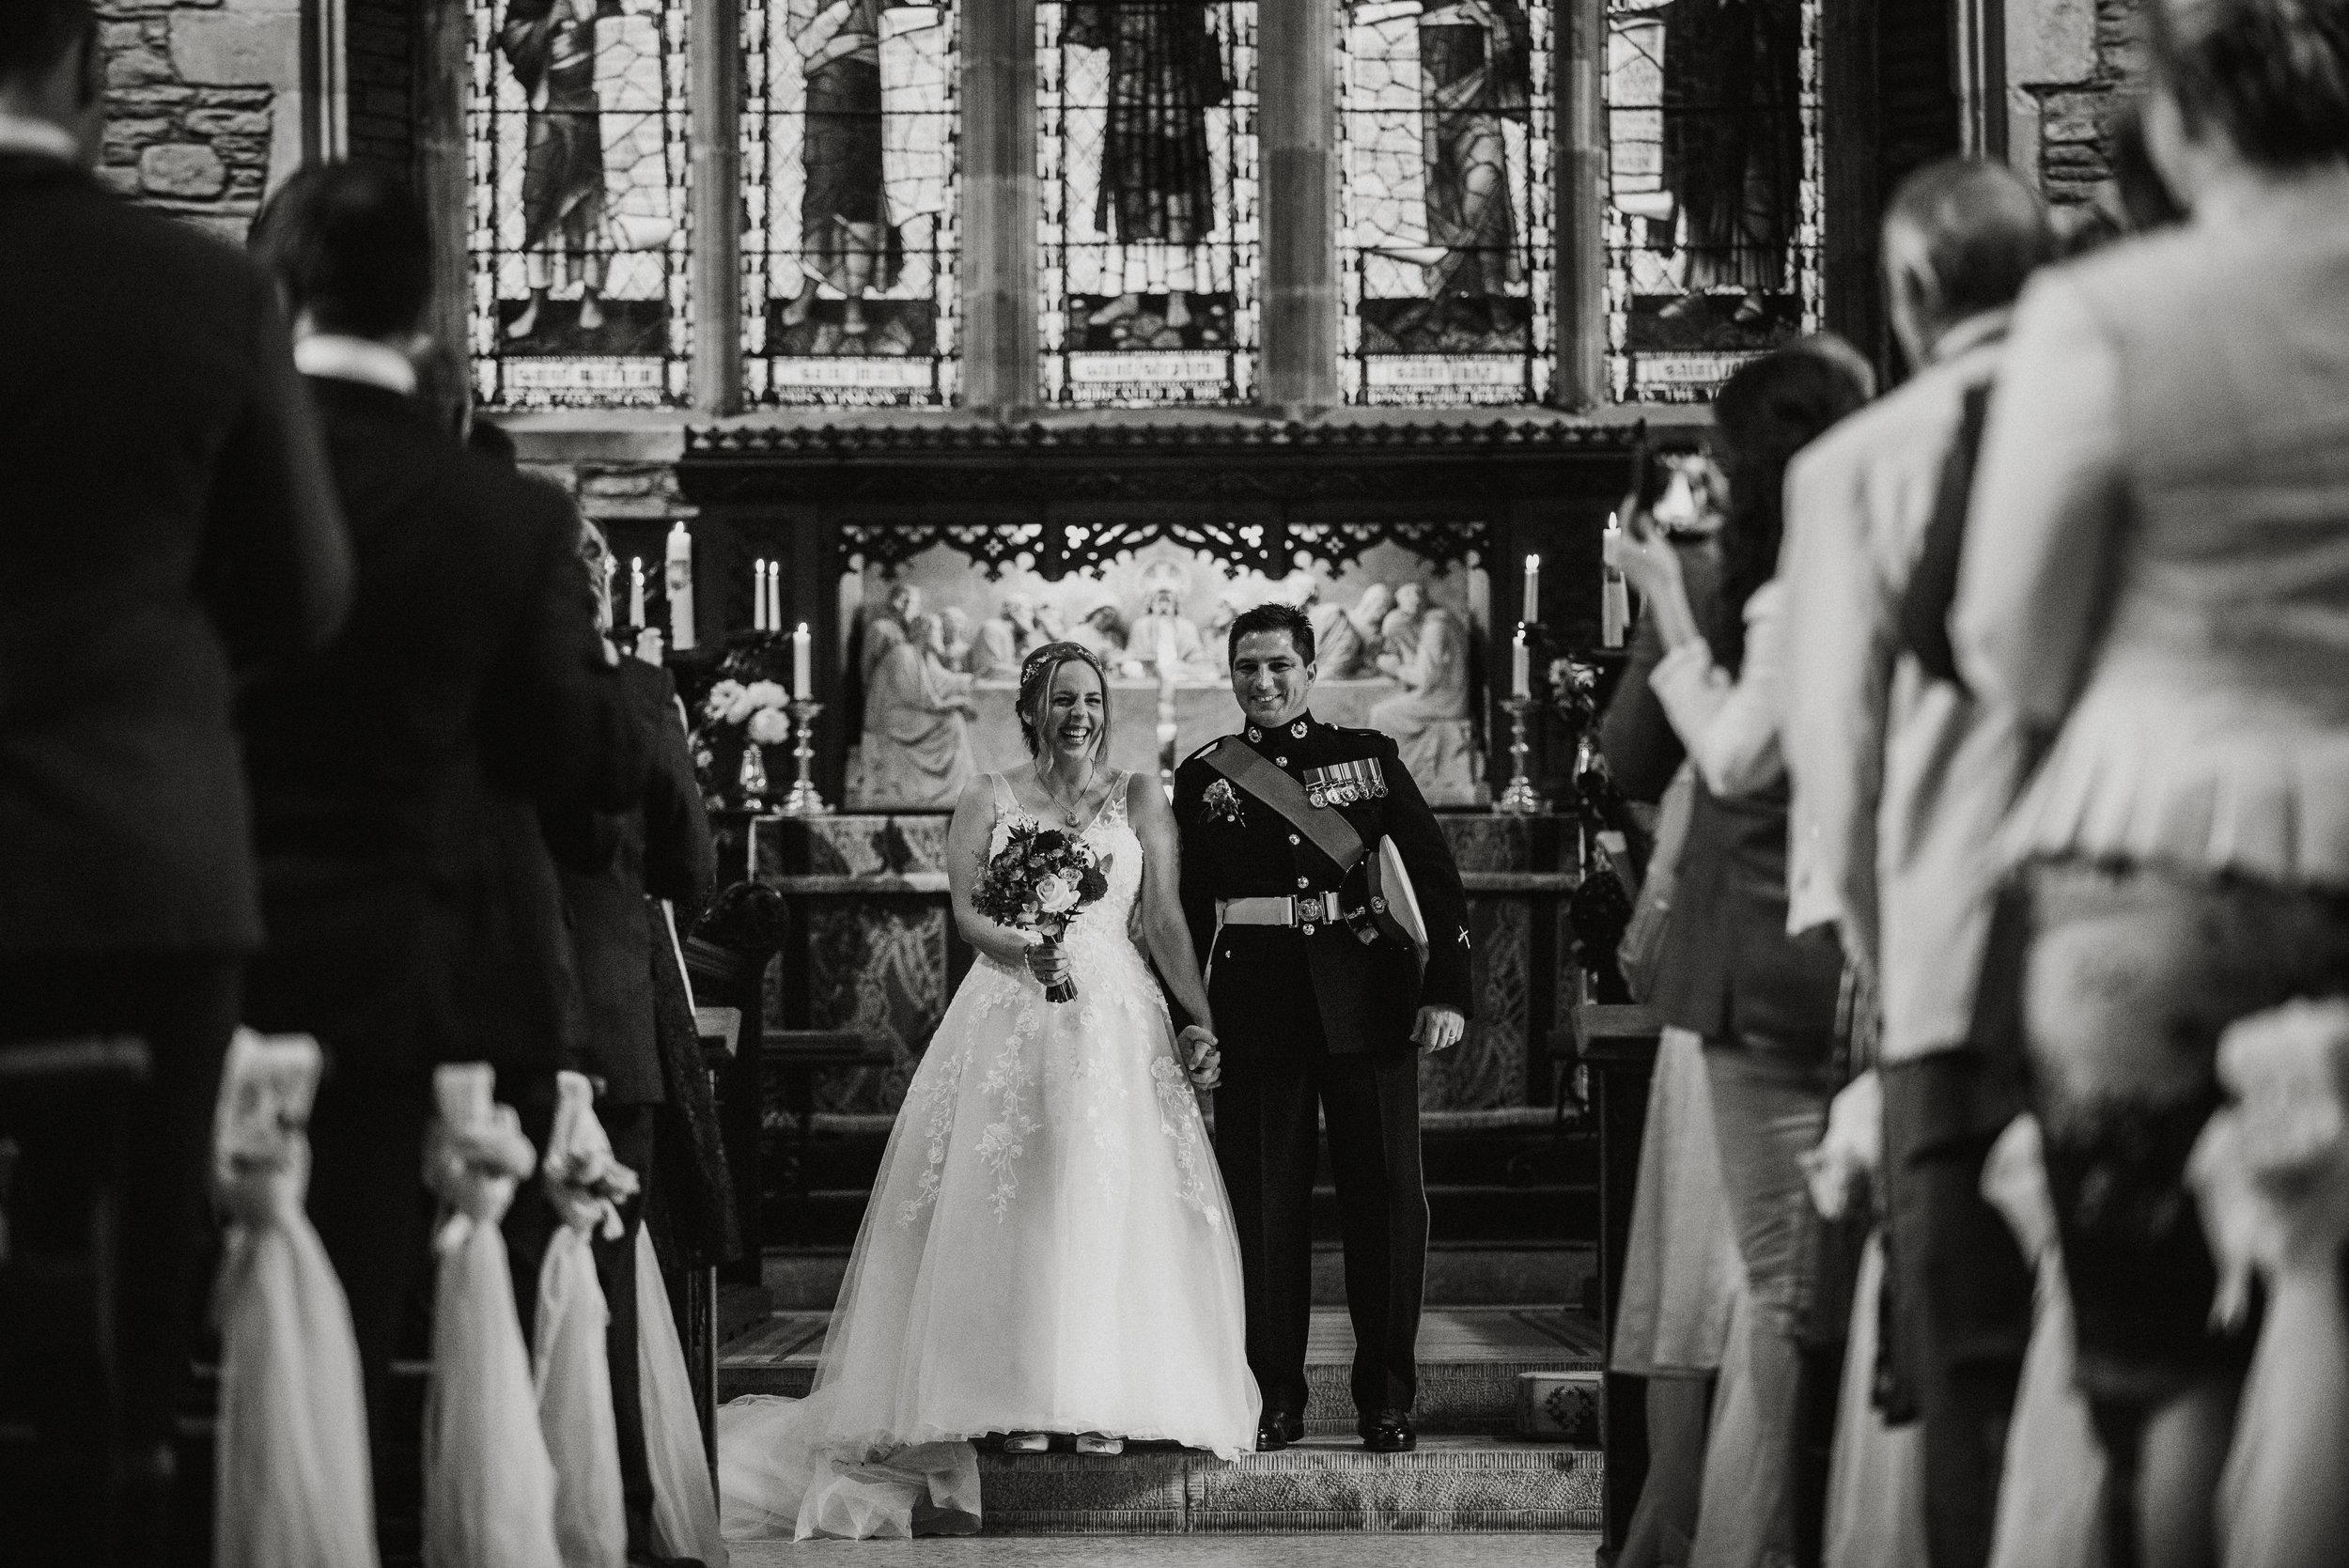 port-eliot-wedding-photographer-32.jpg